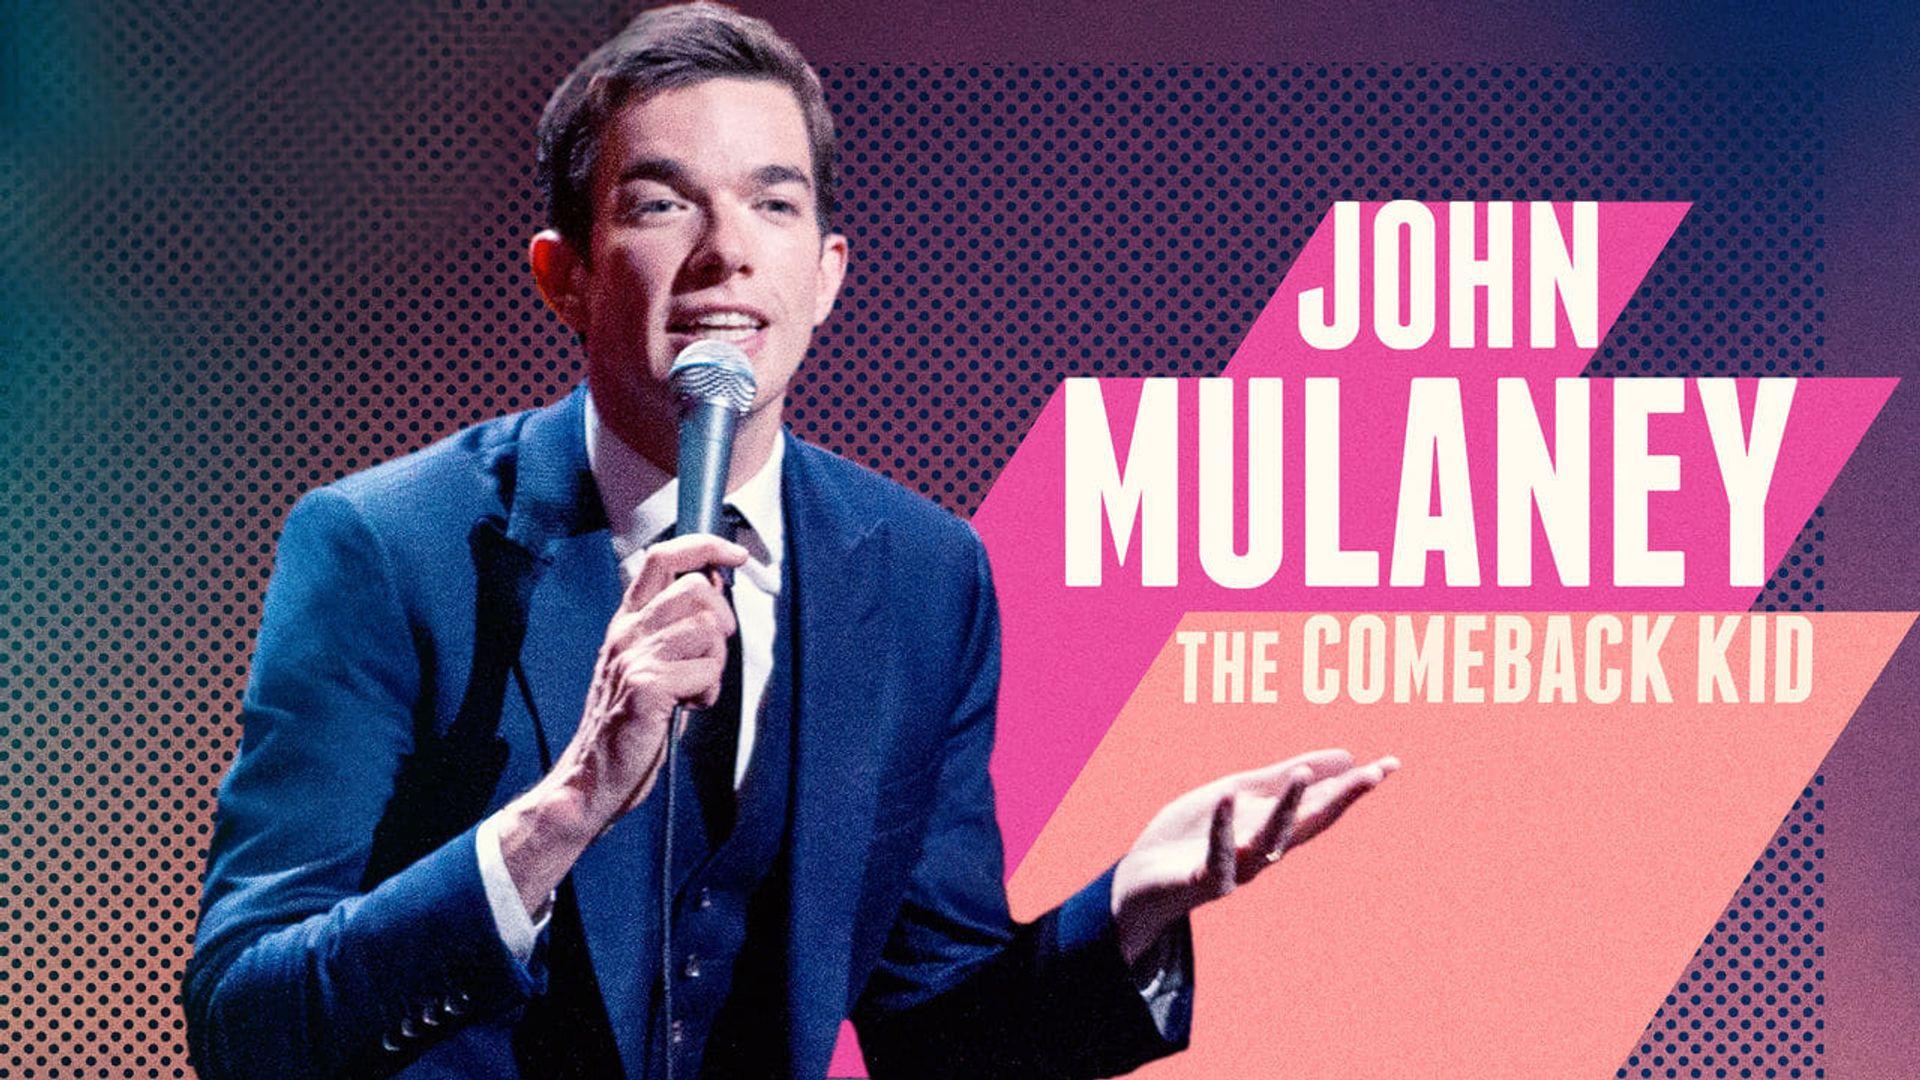 John Mulaney The Comeback Kid Watch Online Free